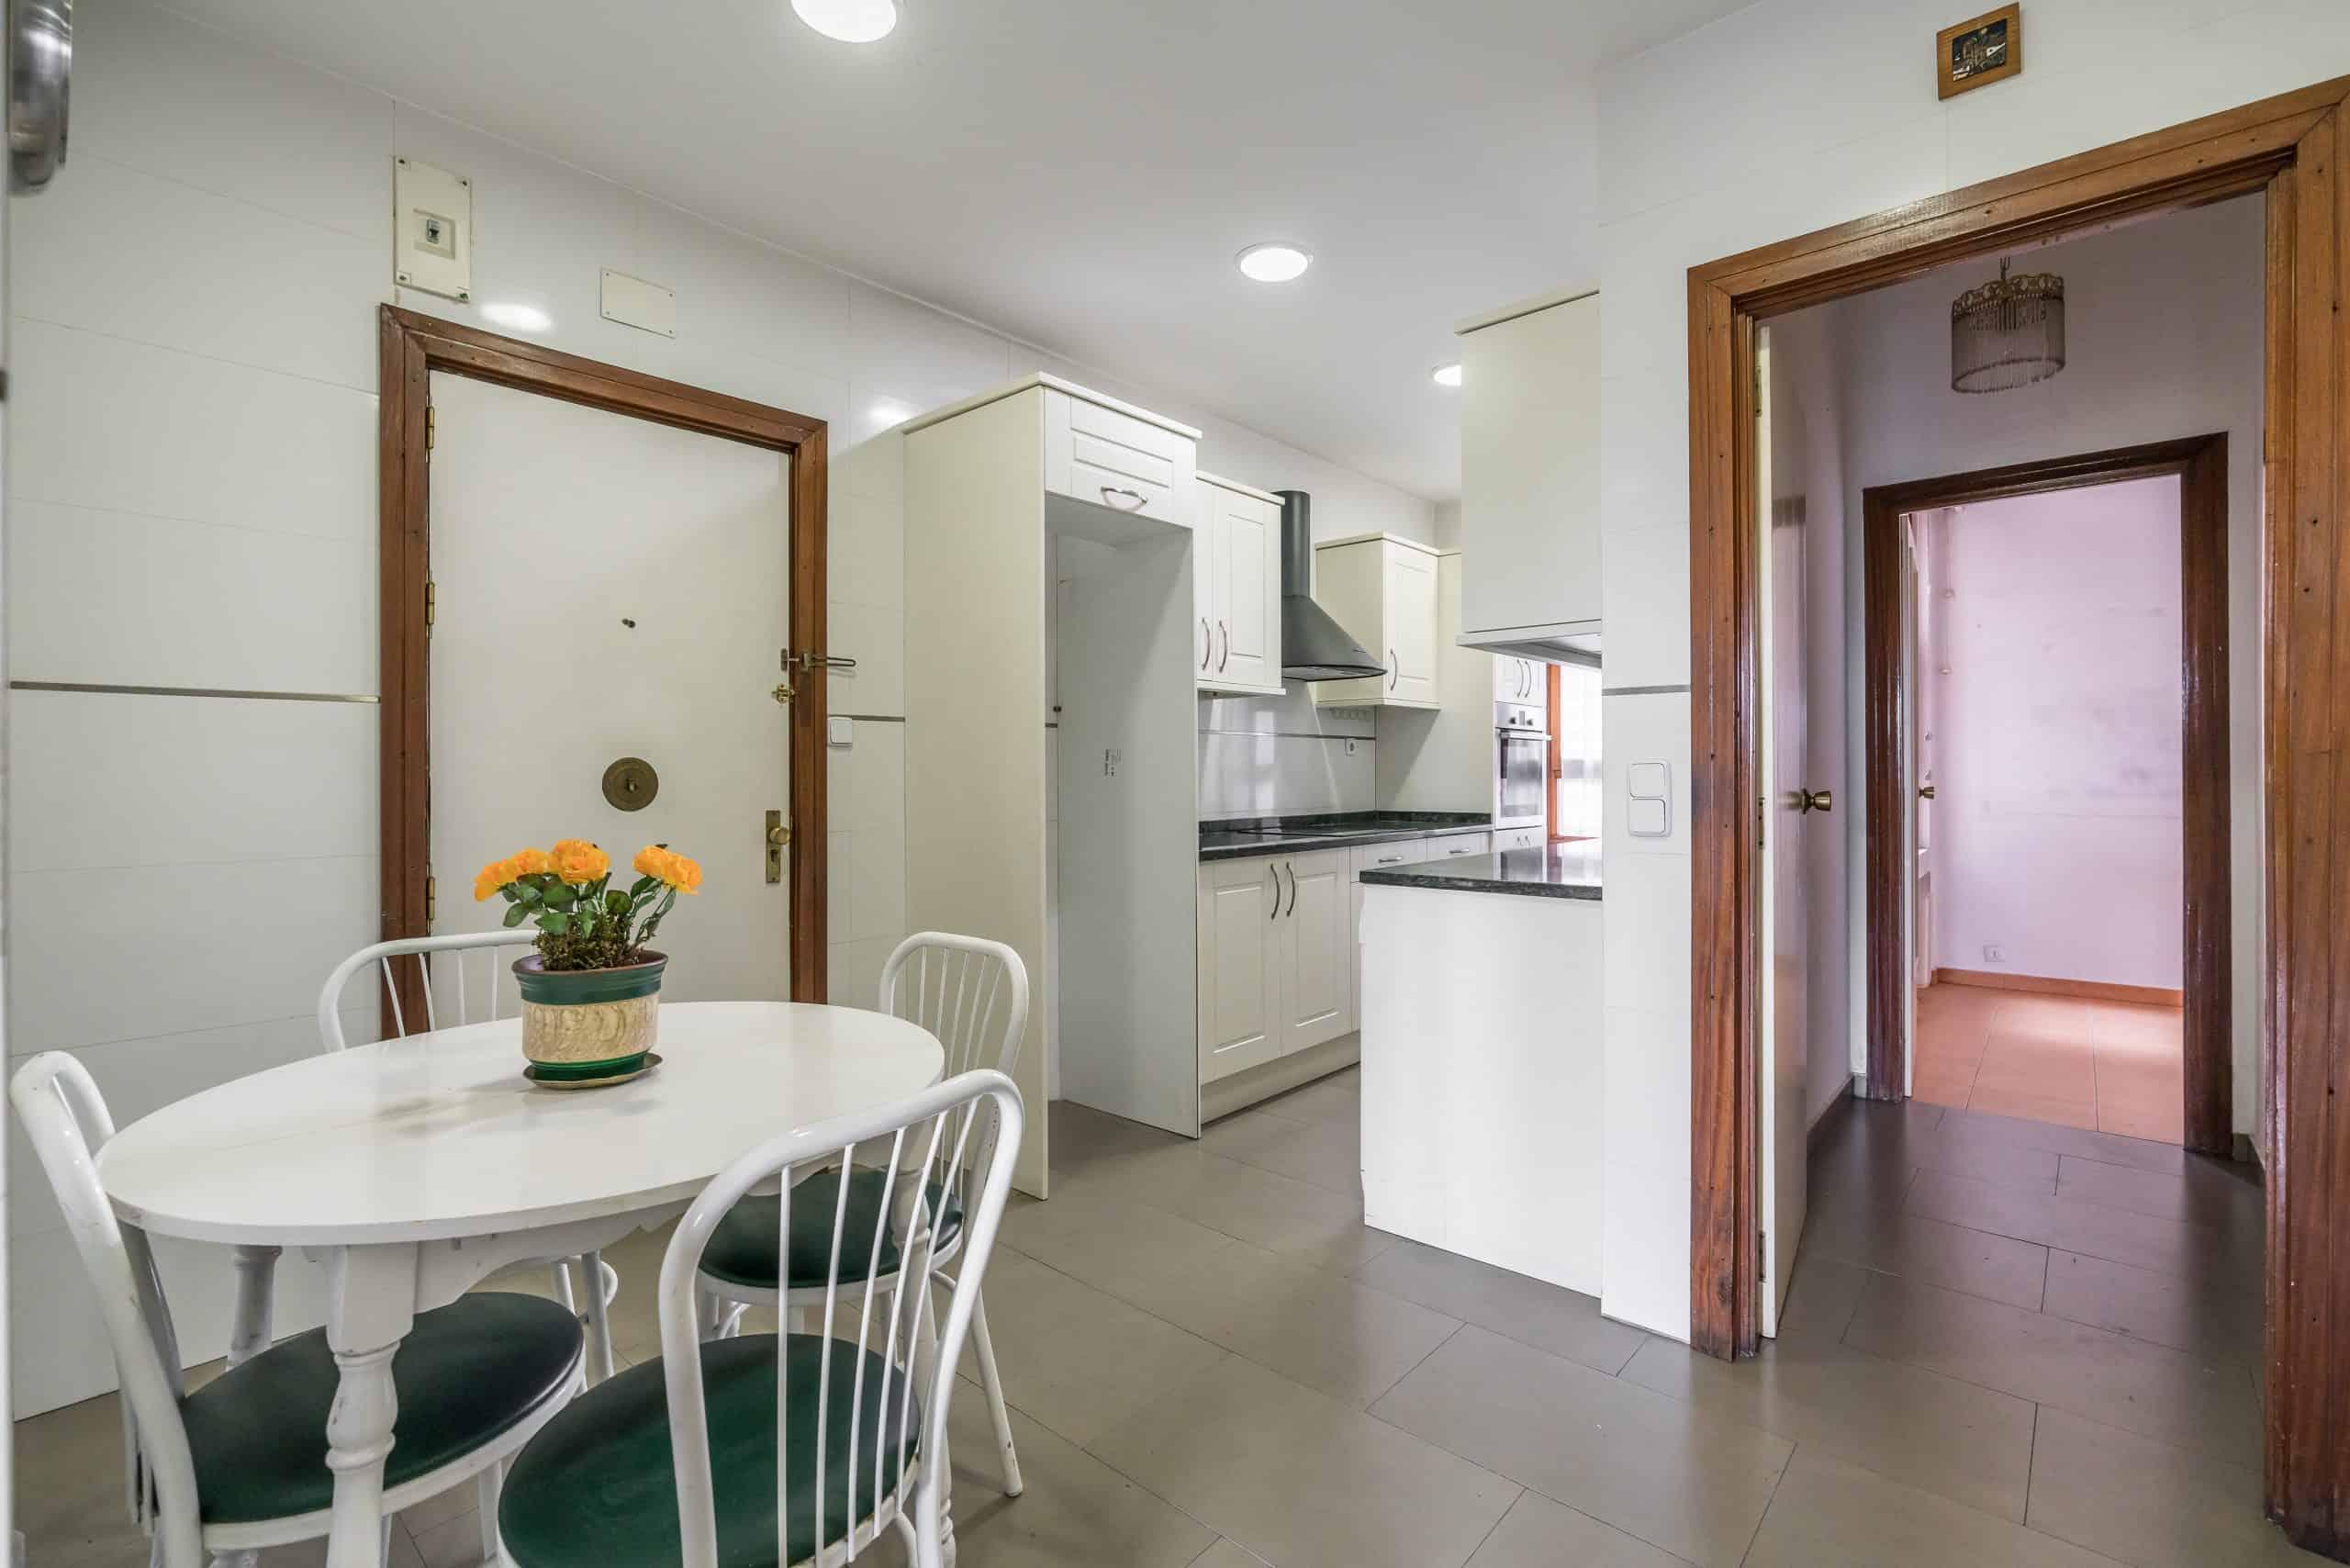 Agencia Inmobiliaria de Madrid-FUTUROCASA-Zona ARGANZUELA-EMBAJADORES-LEGAZPI -calle Embajadores- baño 142